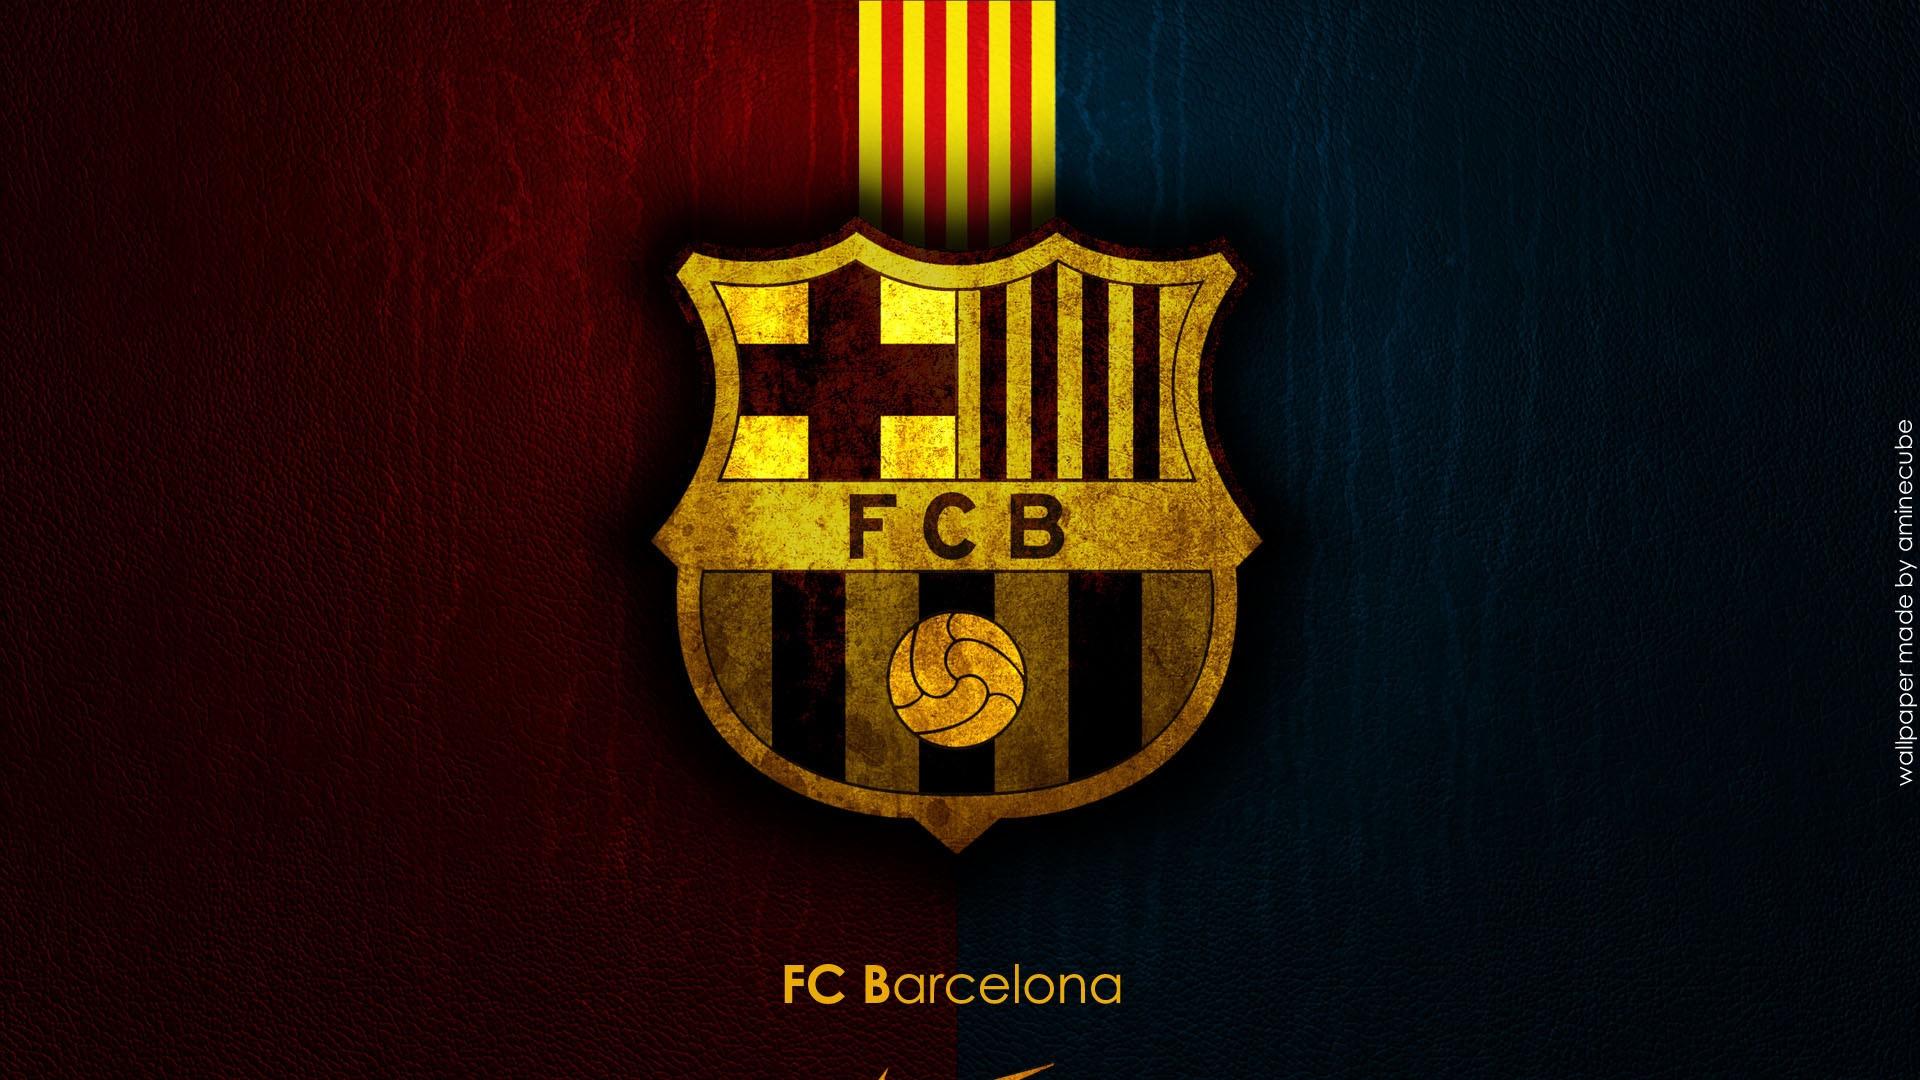 http://hdwallpaperswide co | Football Wallpapers | Pinterest